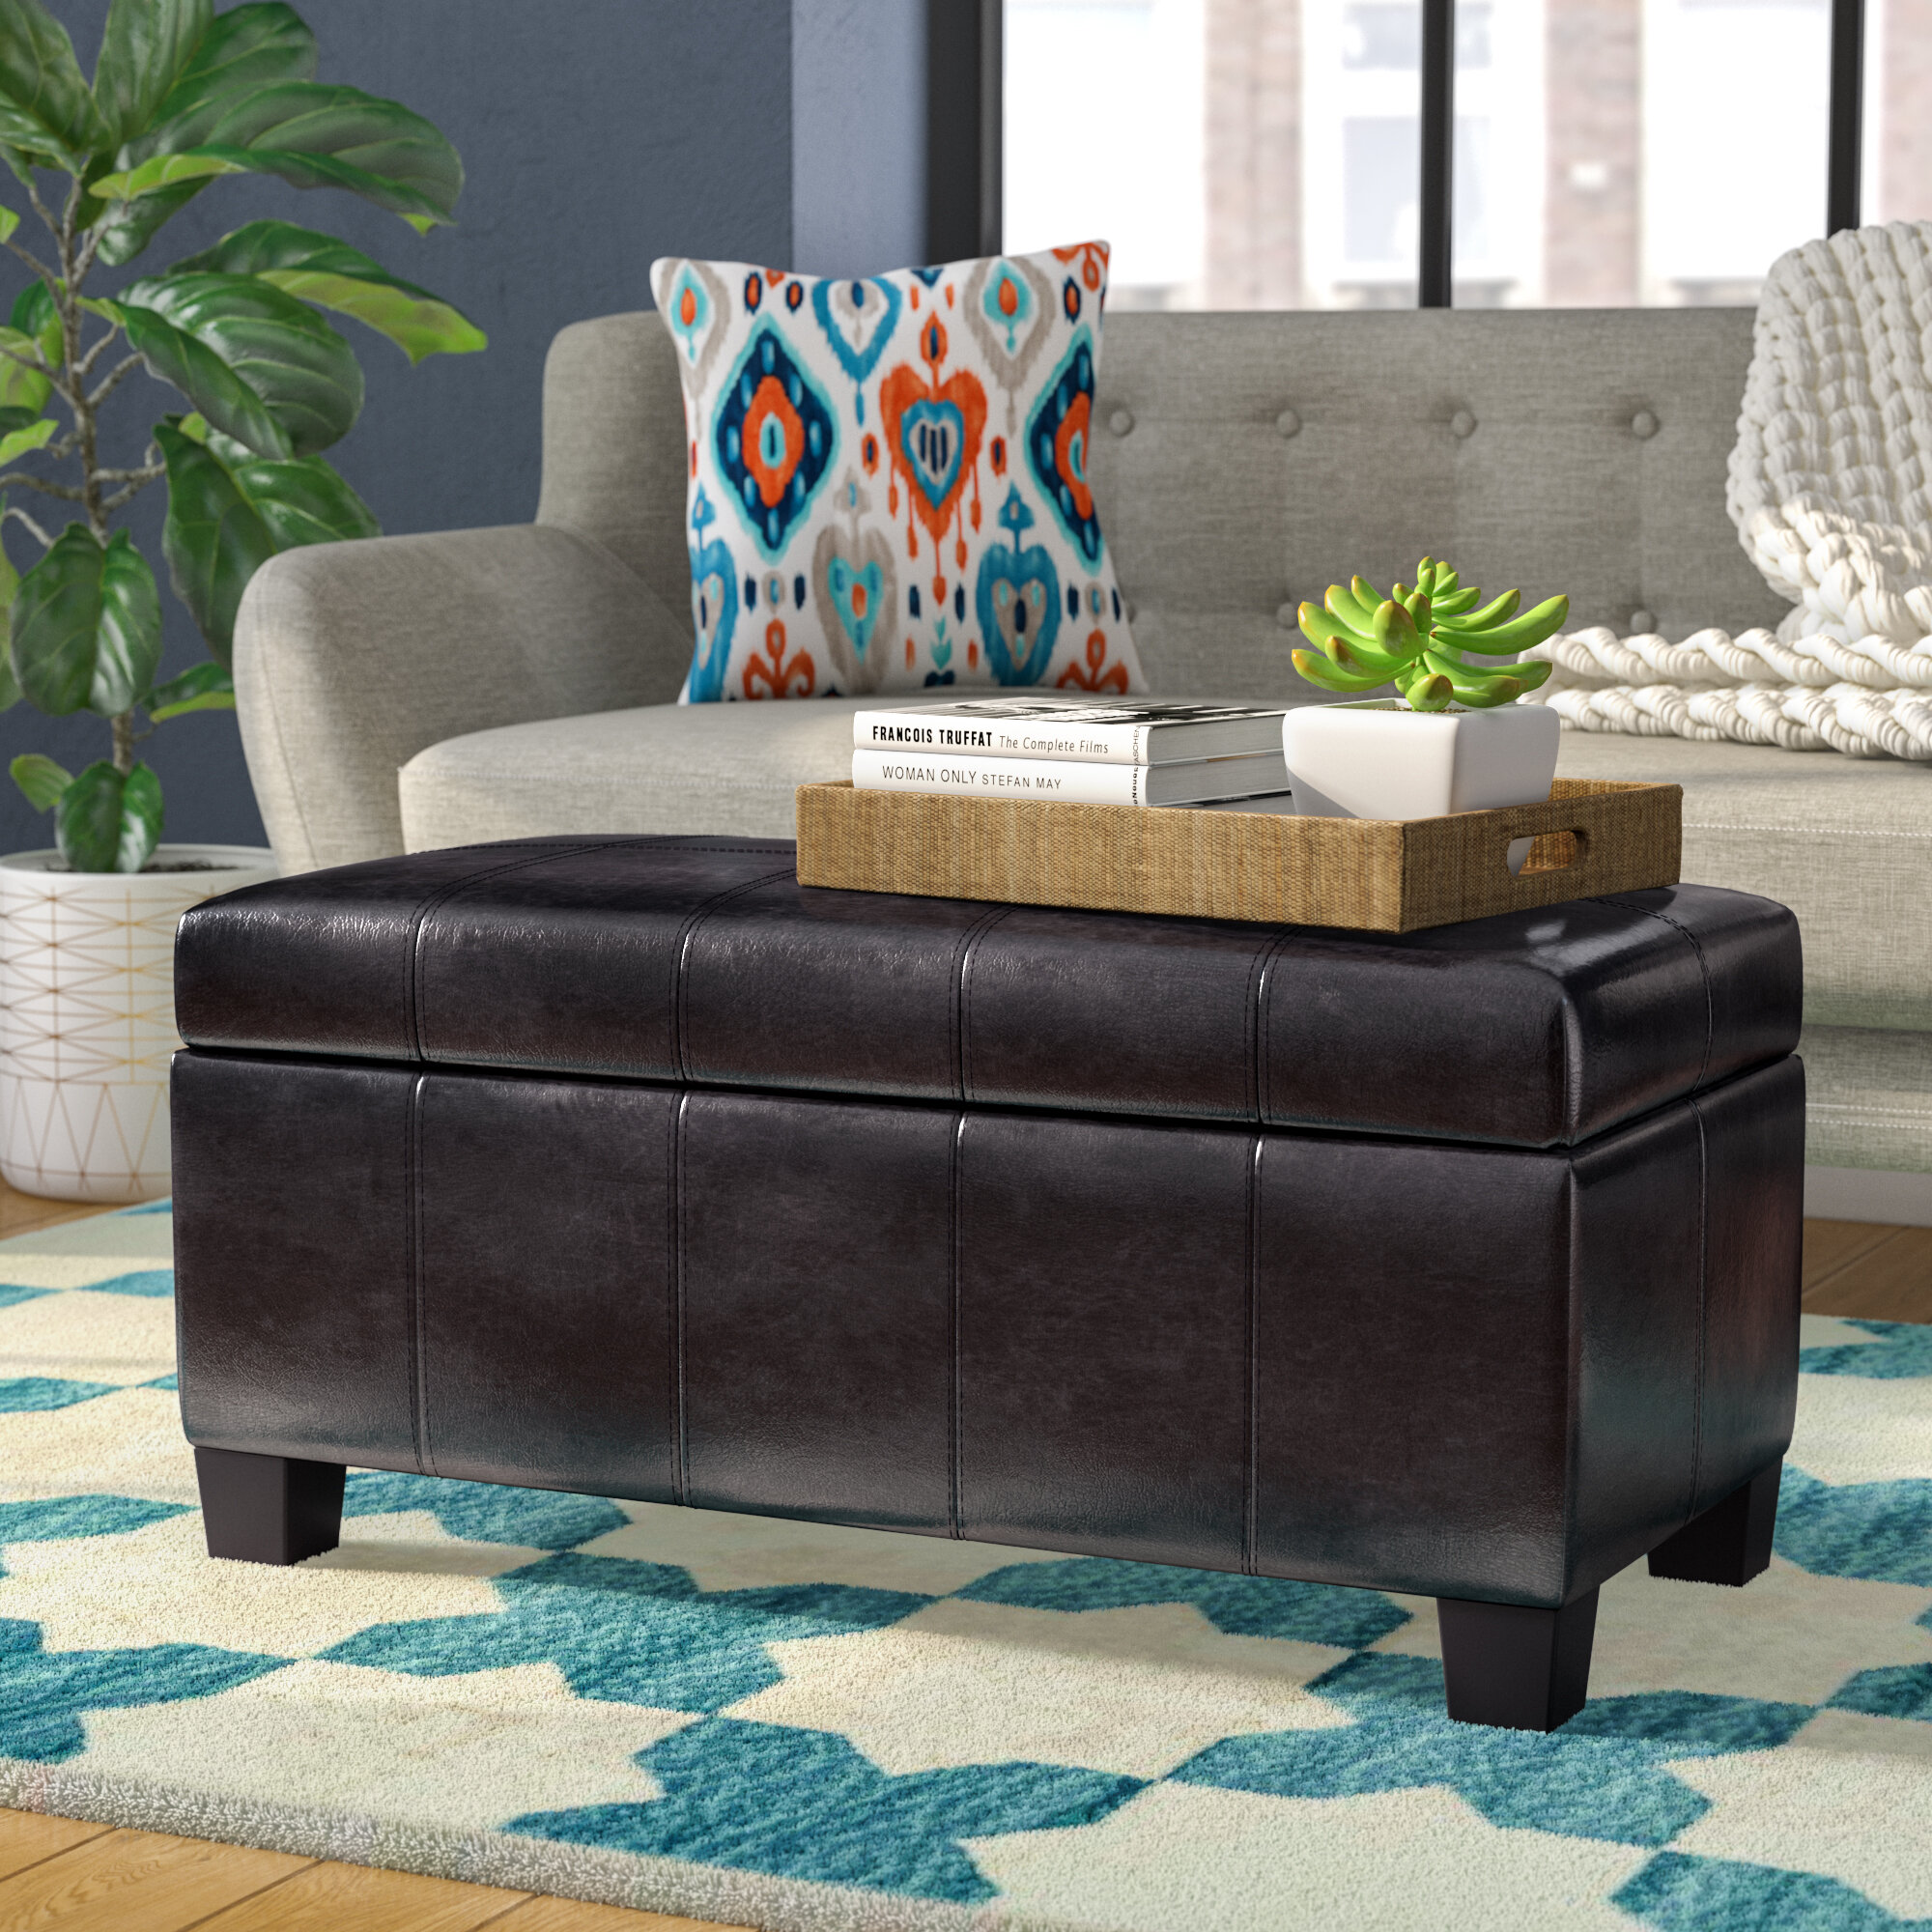 Remarkable Latitude Run Ogallala Upholstered Storage Bench Reviews Machost Co Dining Chair Design Ideas Machostcouk